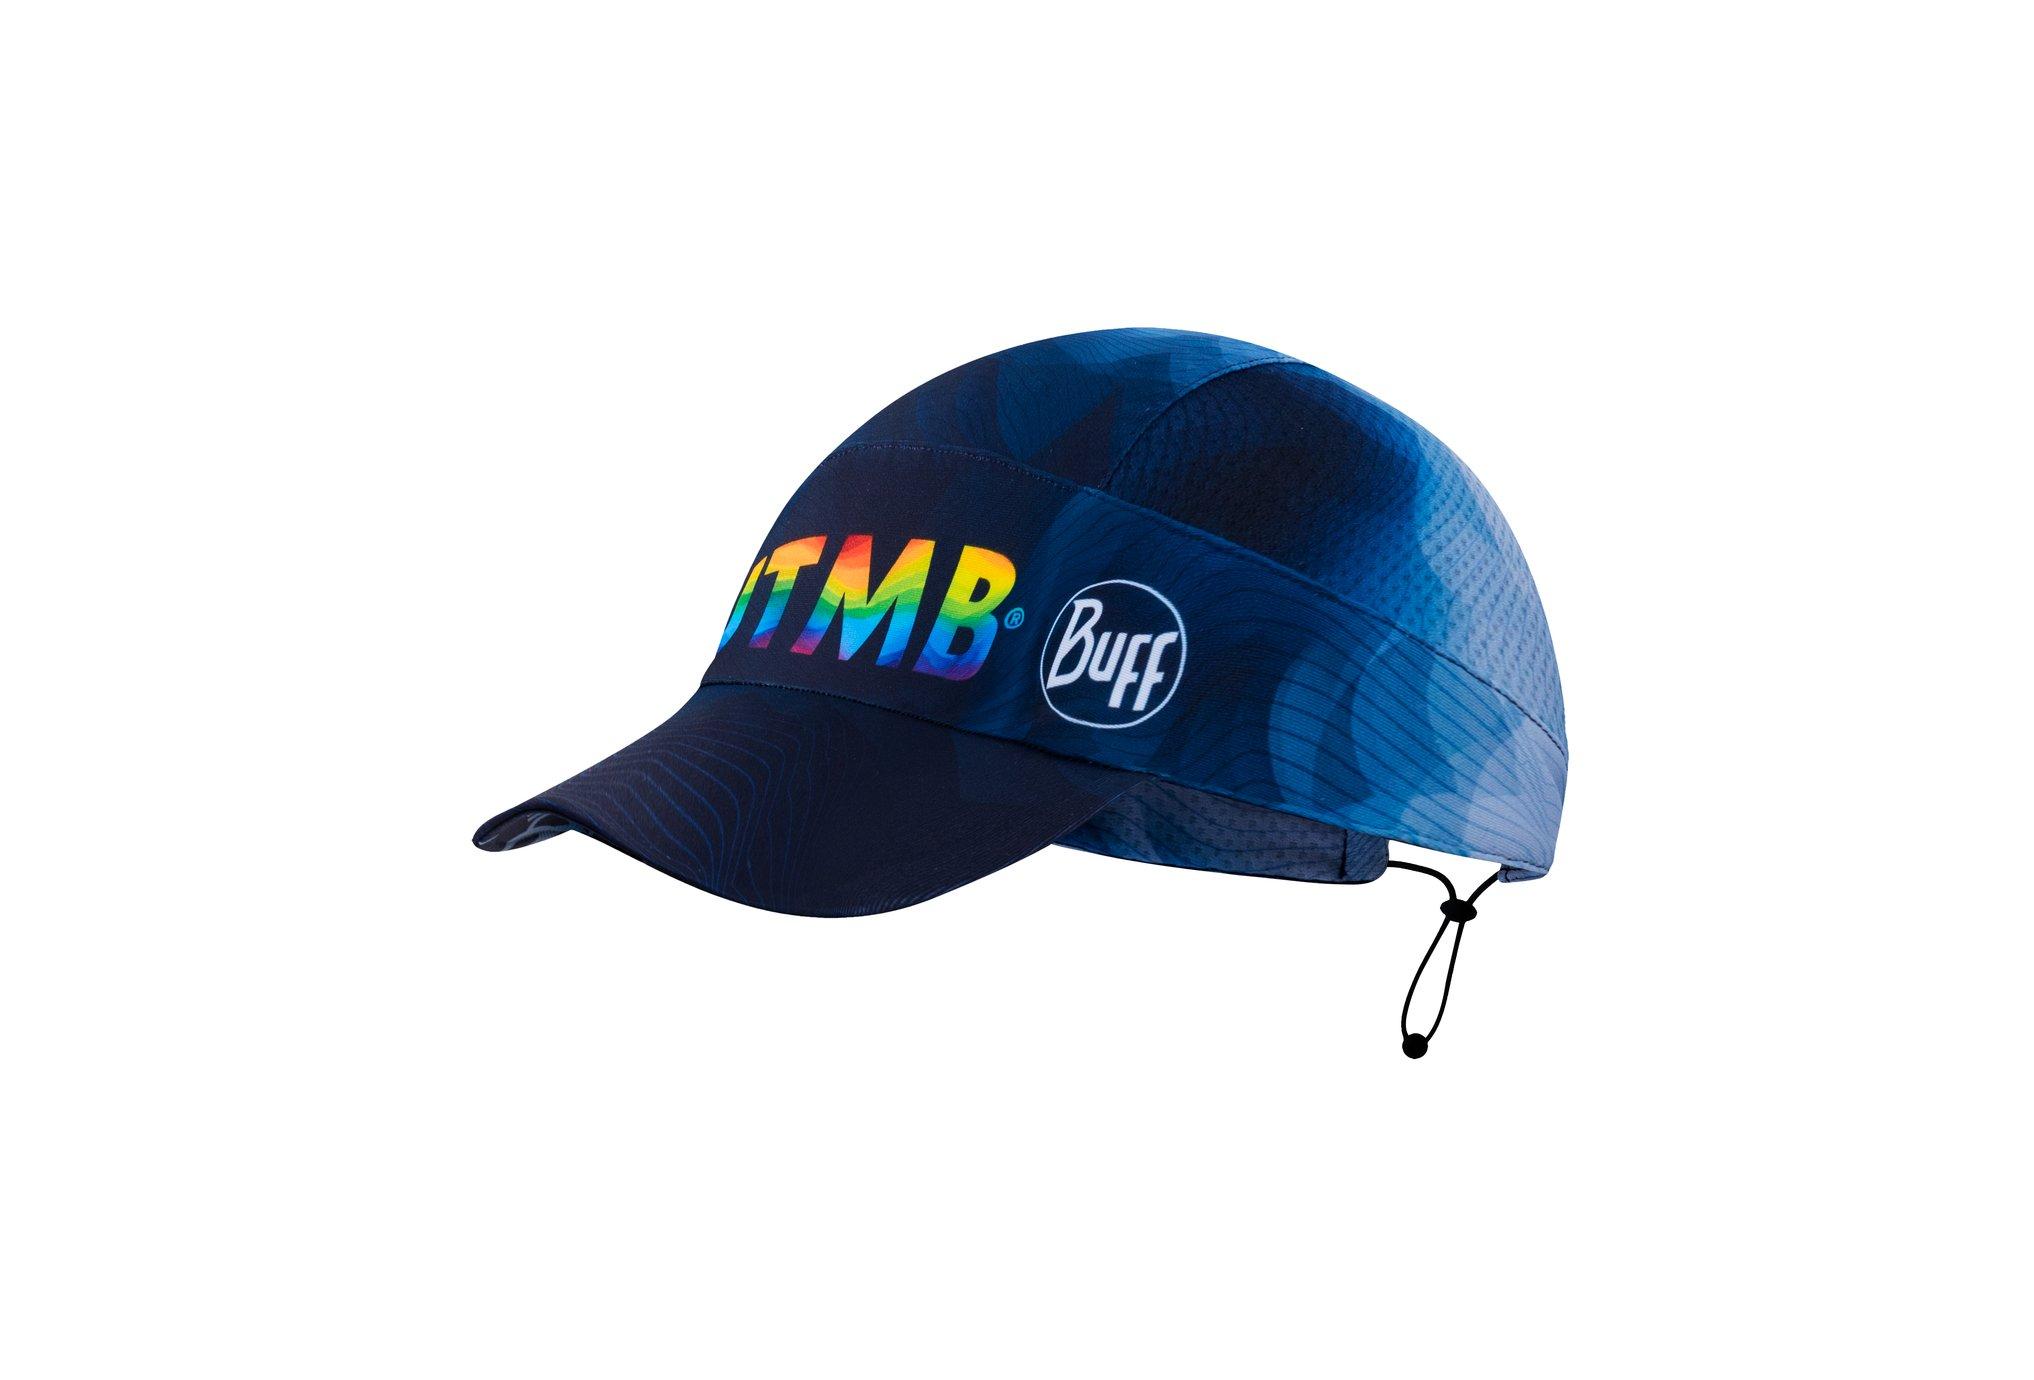 Buff Pack Run Cap UTMB® 2018 Casquettes / bandeaux